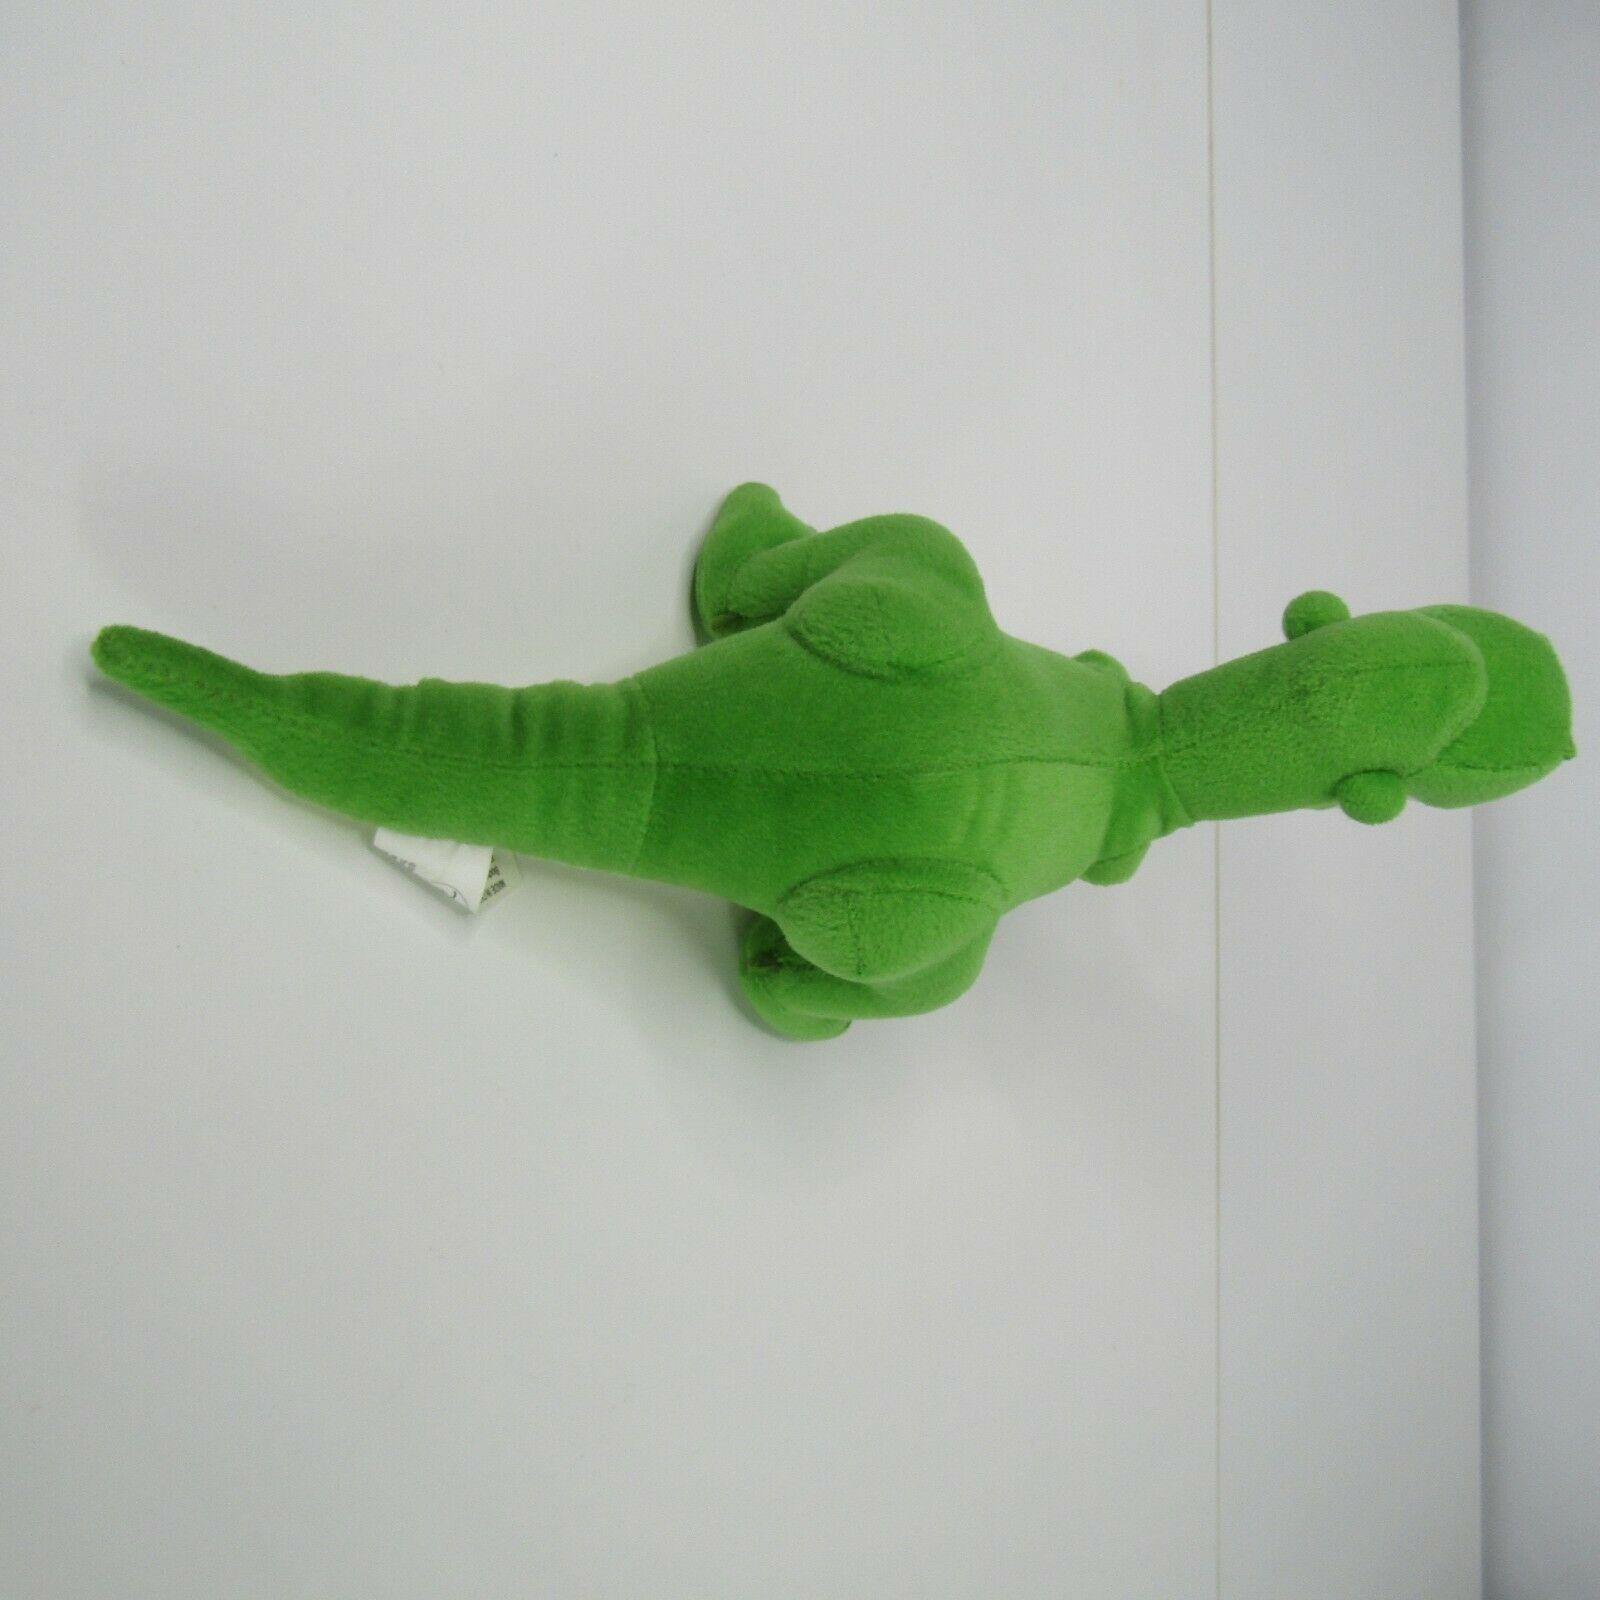 Disney Pixar Toy Story Disney Rex Plush Stuffed Animal 7 inch